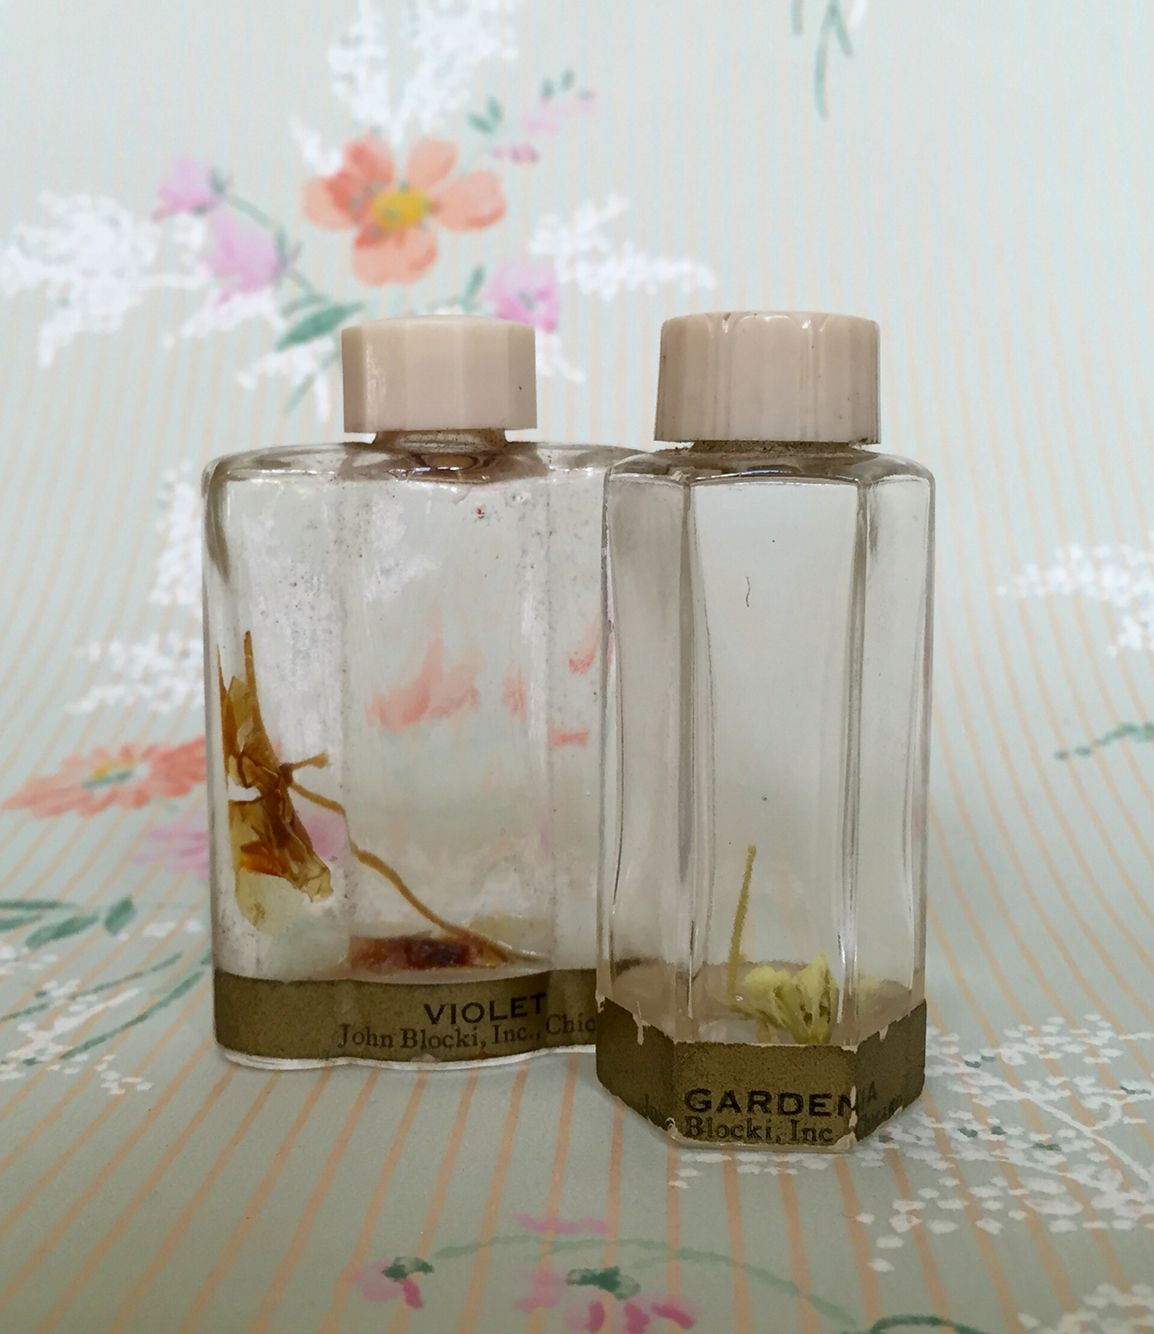 Blocki mini perfume bottles, circa 1920